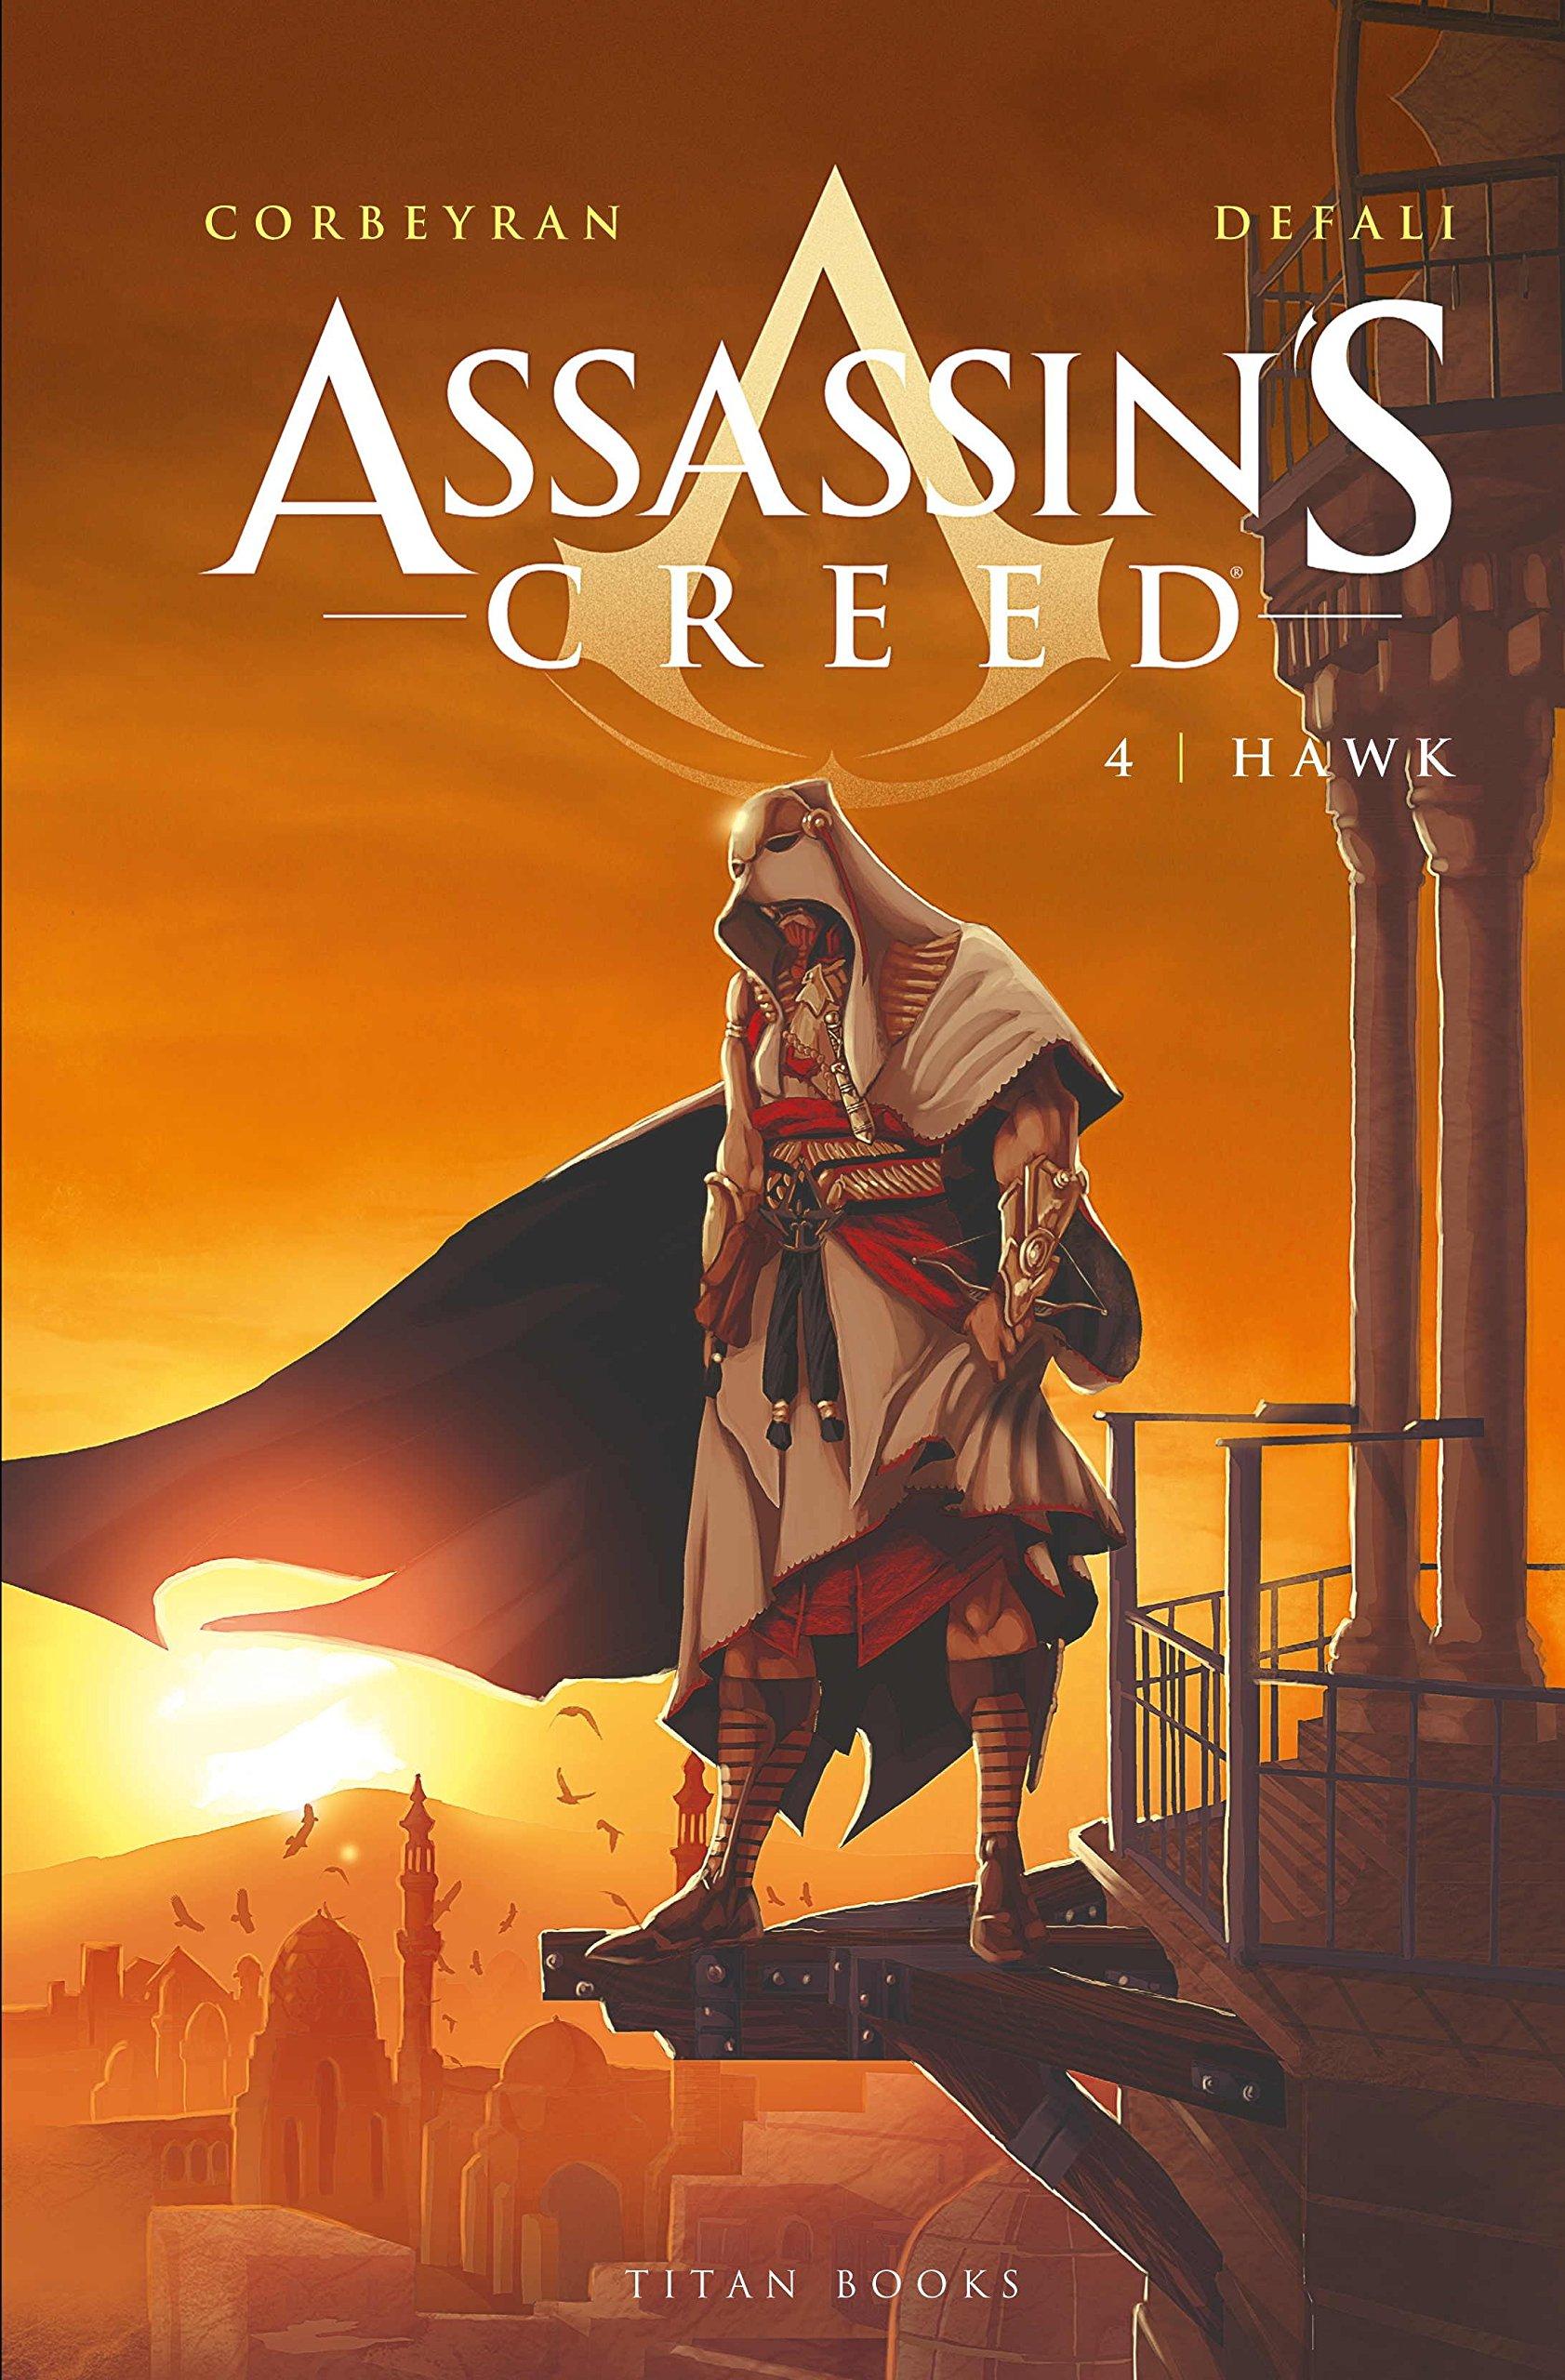 Assassin S Creed 4 Hawk Assassin S Creed Wiki Fandom